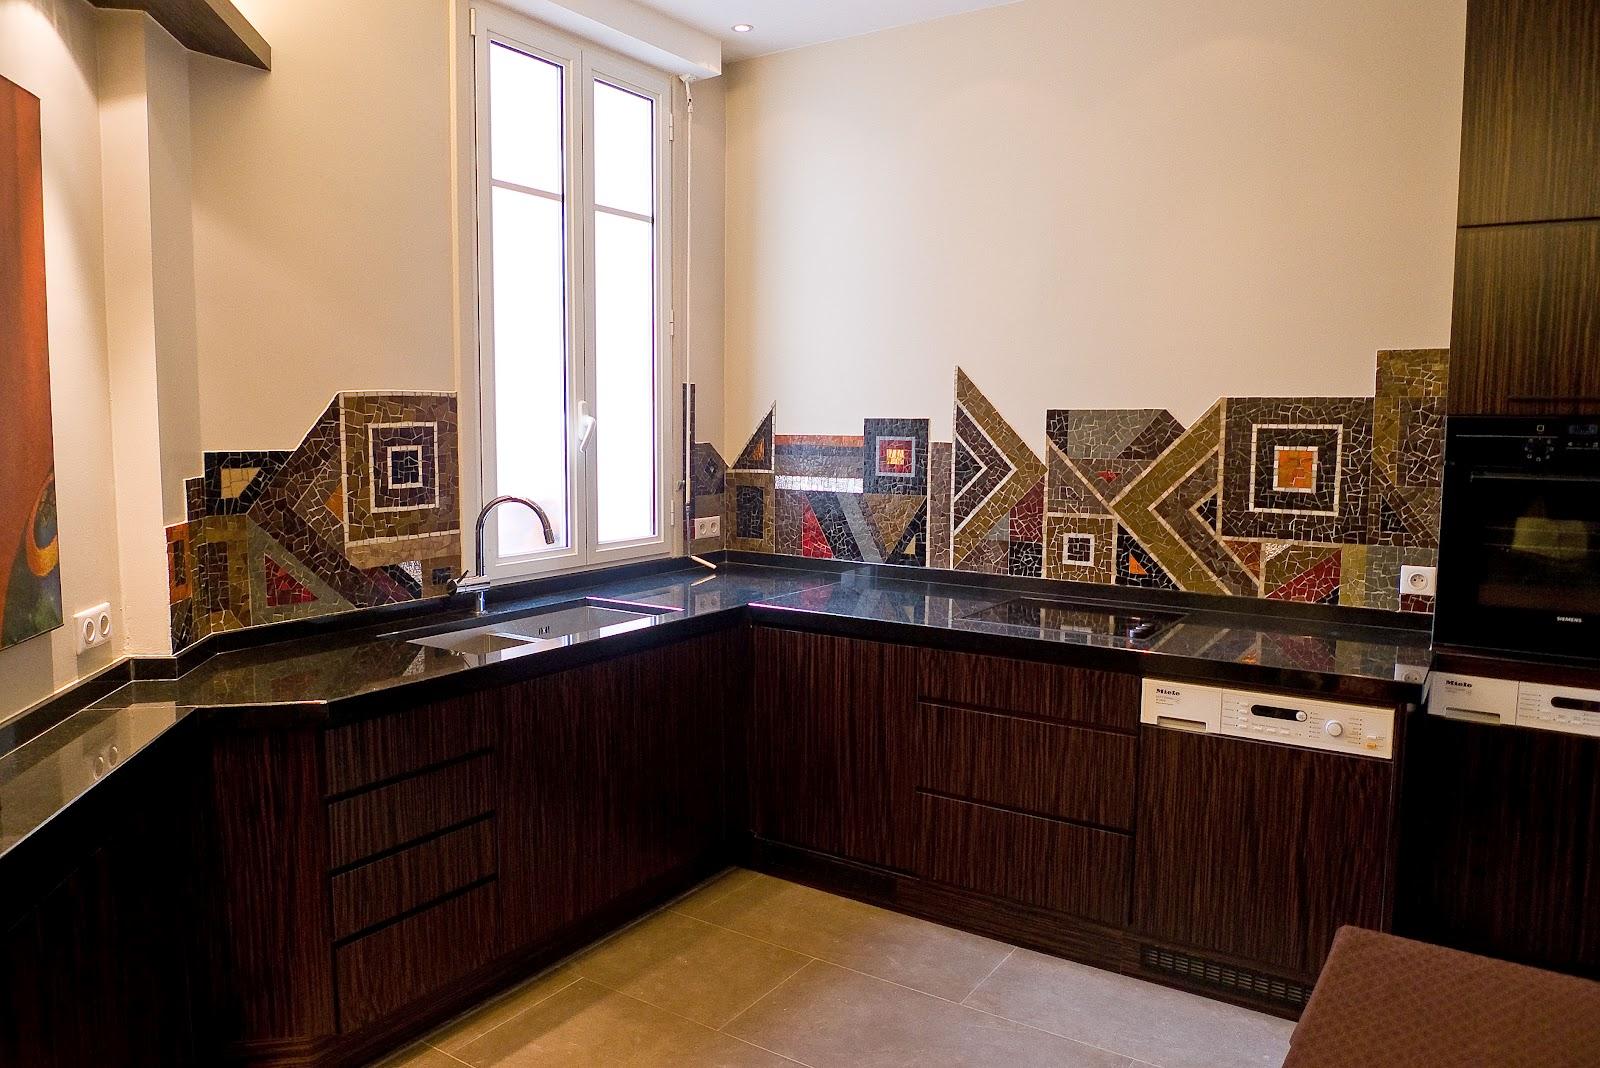 mosa ques les flocats cr dence cuisine particulier. Black Bedroom Furniture Sets. Home Design Ideas